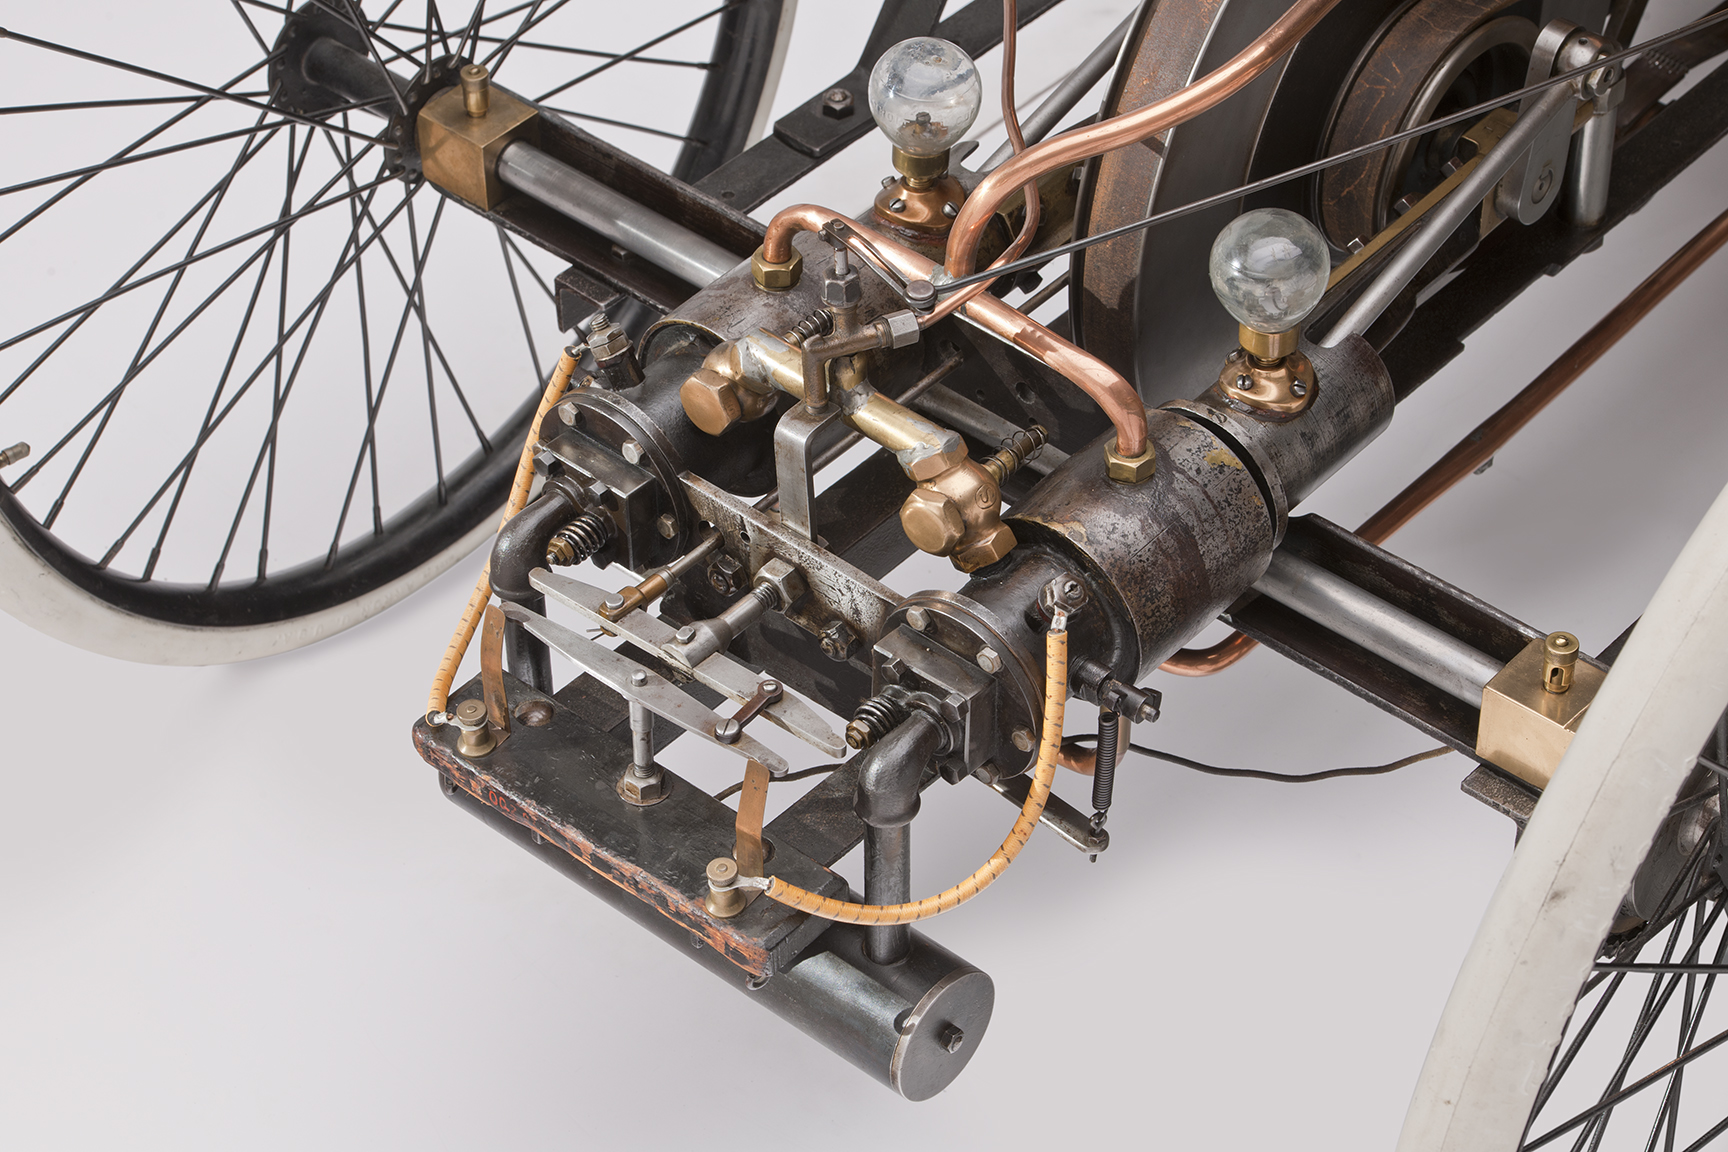 1896 Ford Quadricycle engine